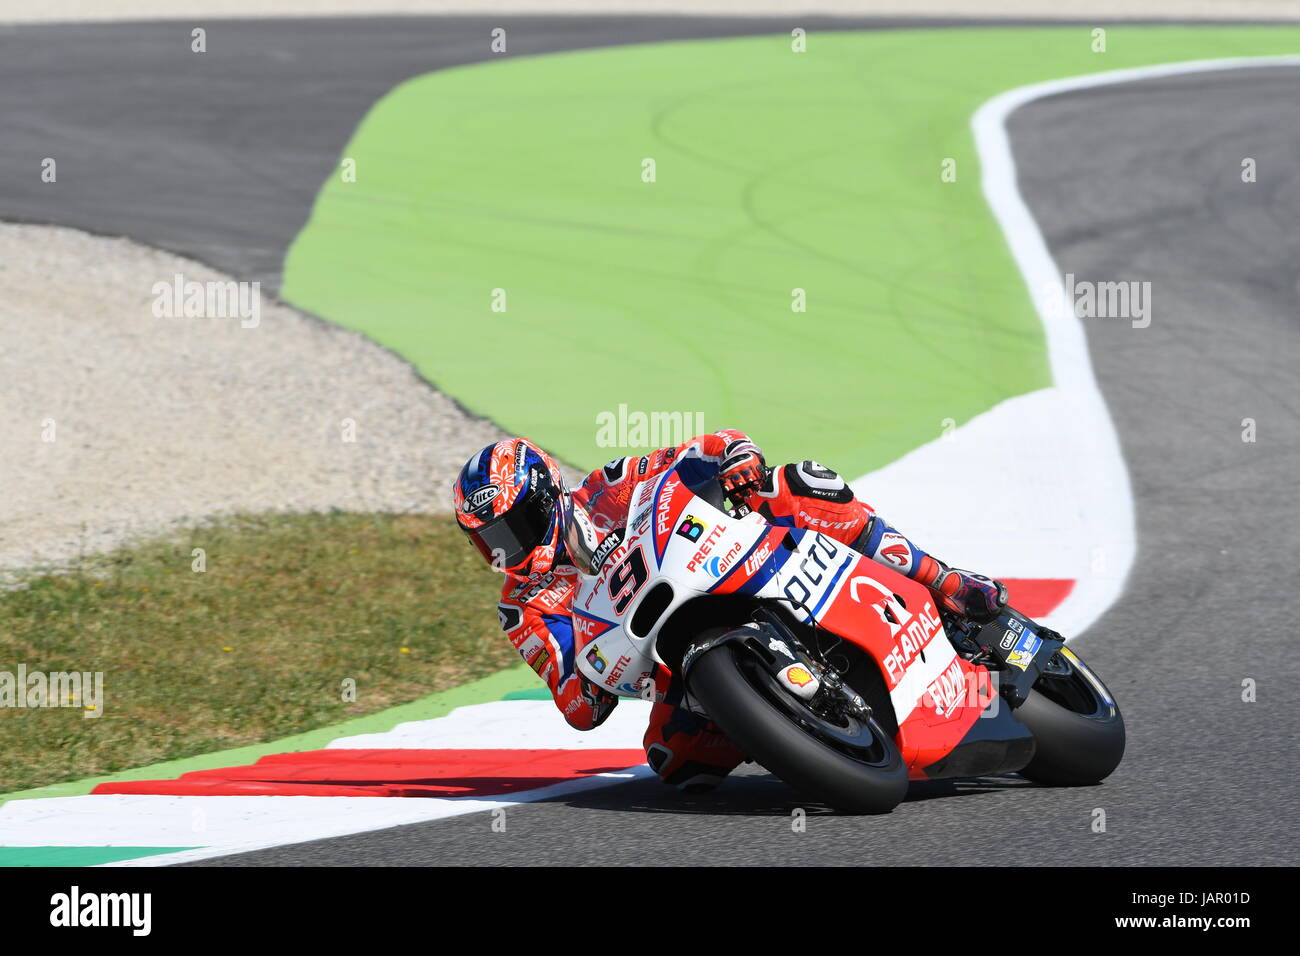 Mugello - ITALY, JUNE 3: Italian Ducati Pramac rider Danilo Petrucci at 2017 OAKLEY GP of Italy of Mugello MotoGP - Stock Image